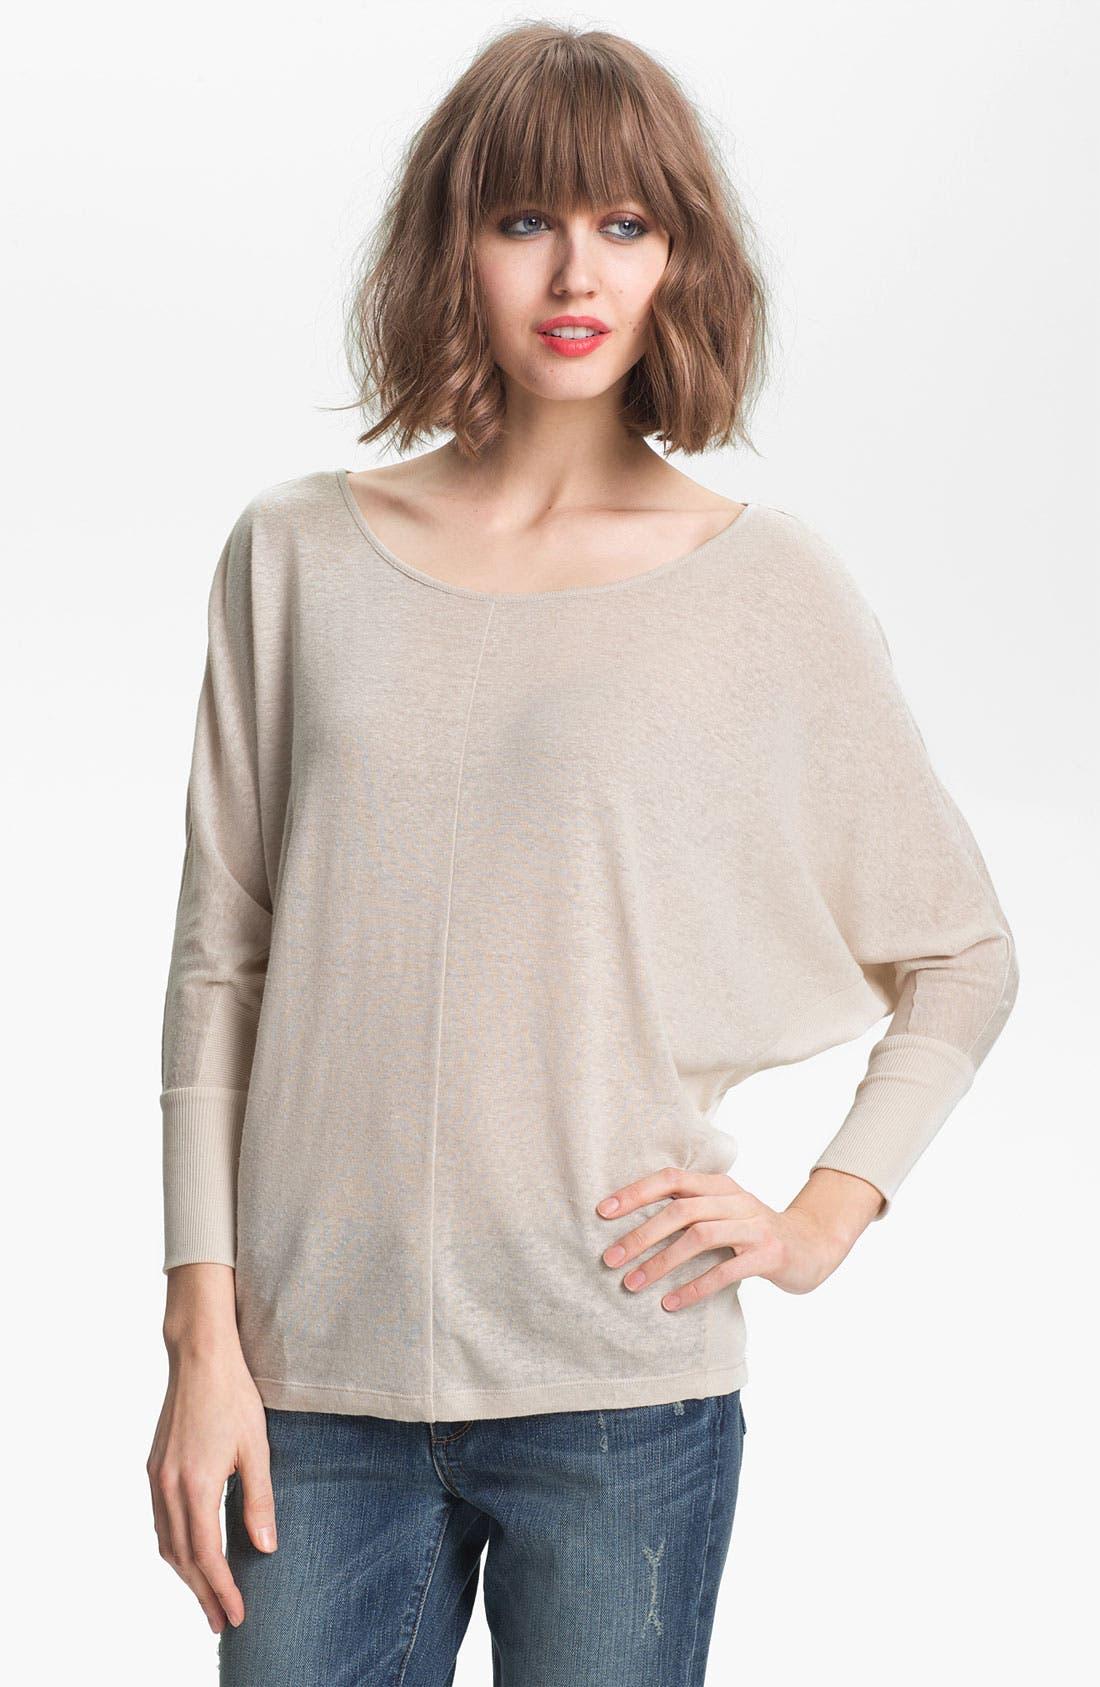 Alternate Image 1 Selected - Trouvé Sheer Linen Blend Dolman Top